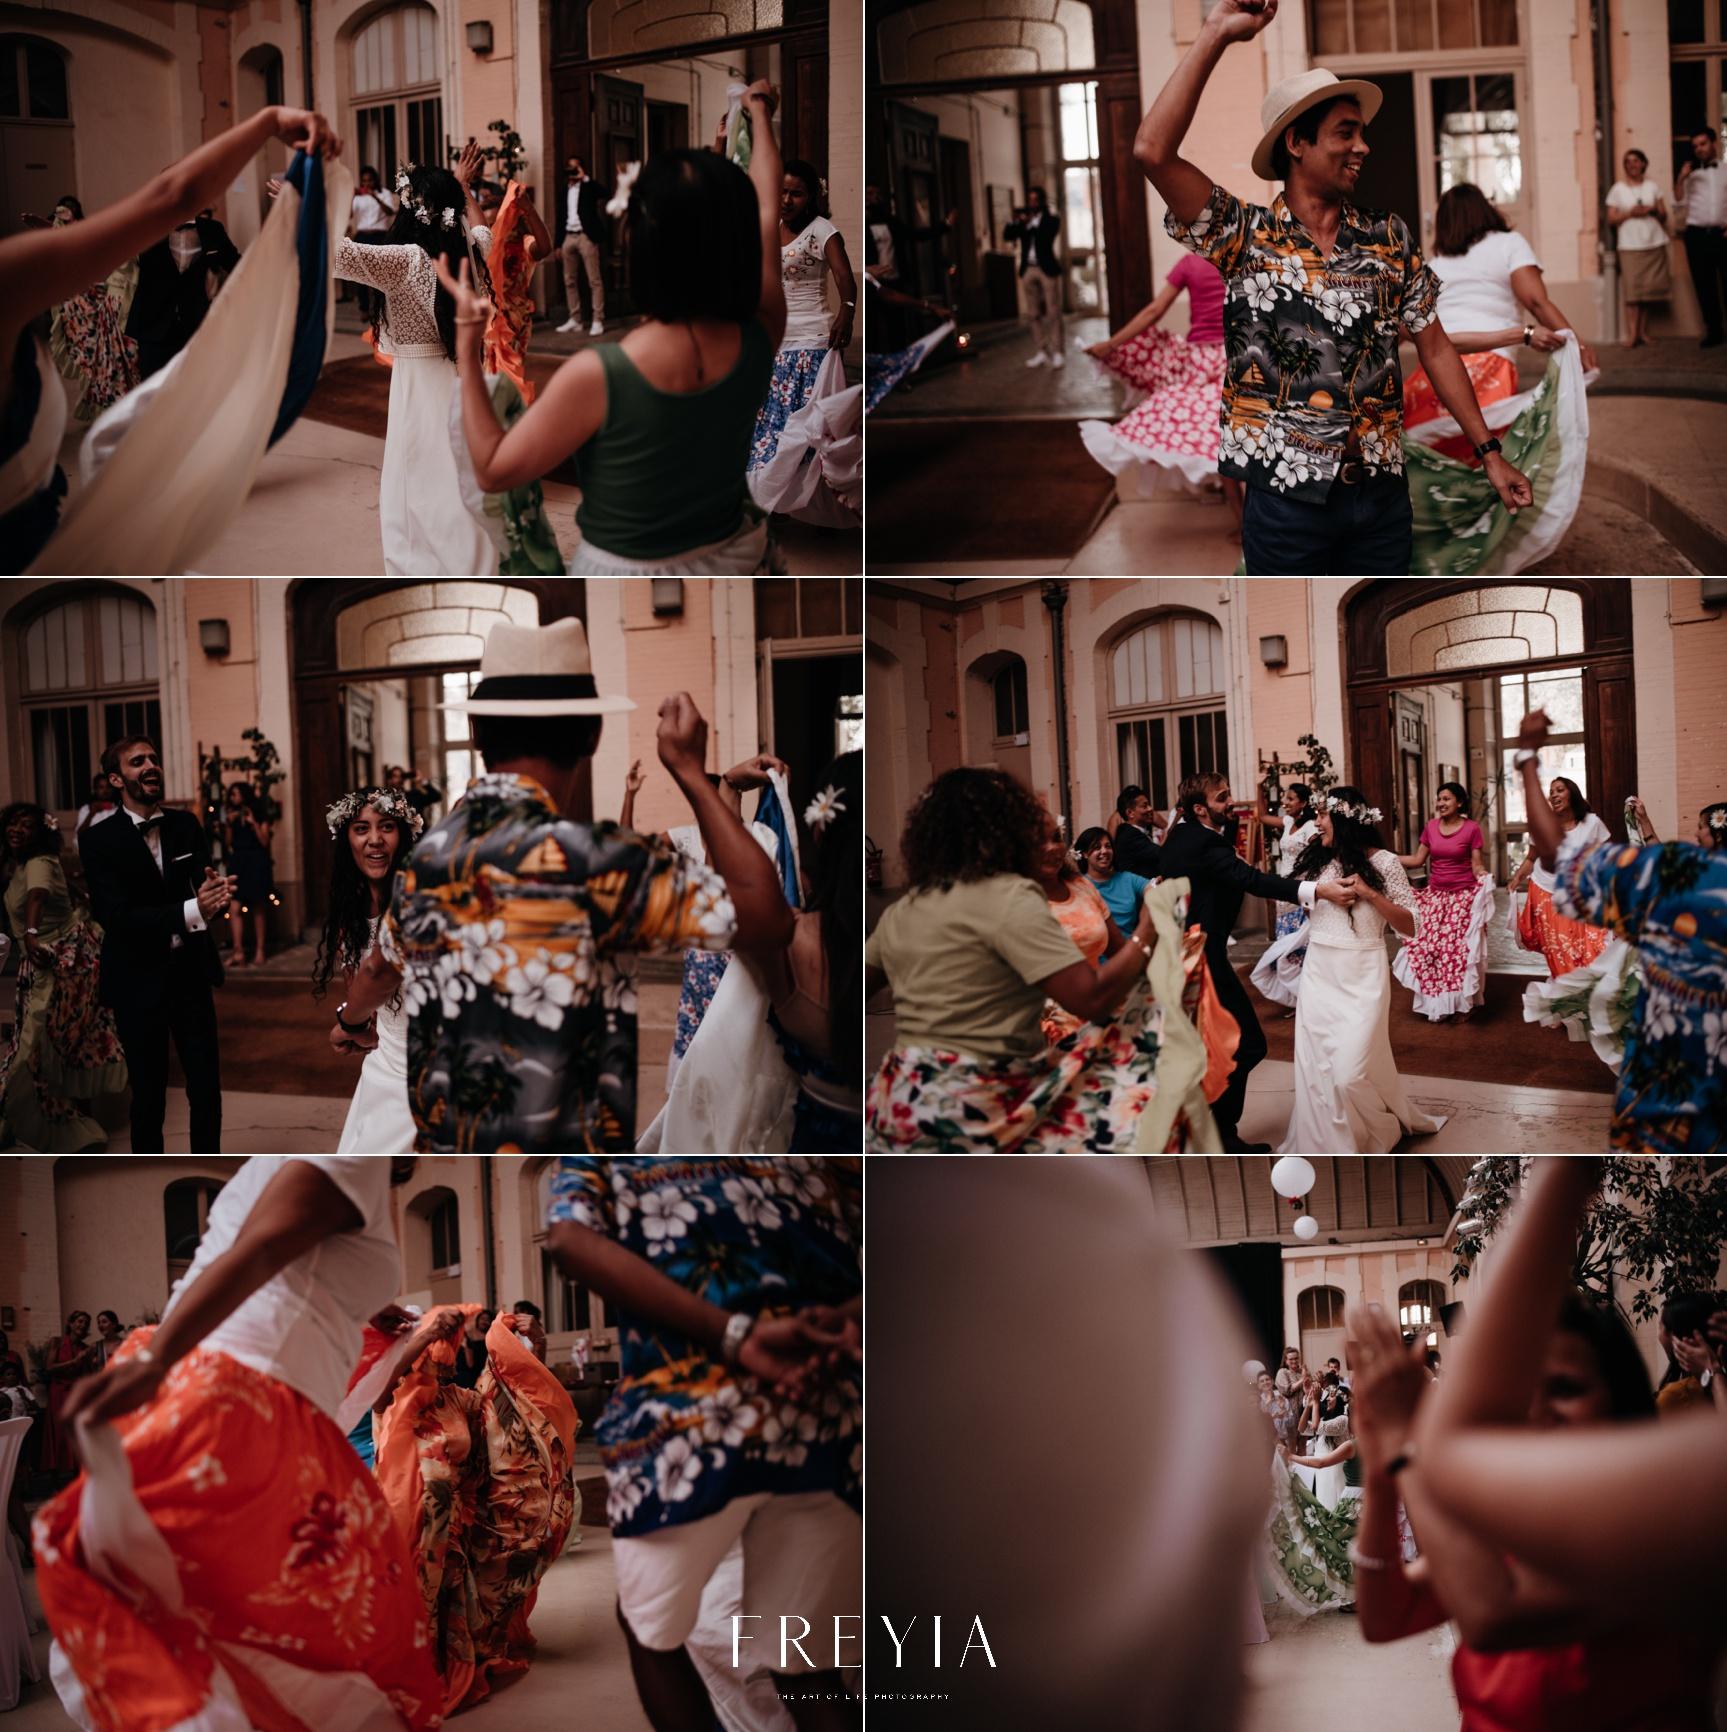 R + T |  mariage reportage alternatif moody intime minimaliste vintage naturel boho boheme |  PHOTOGRAPHE mariage PARIS france destination  | FREYIA photography_-342.jpg